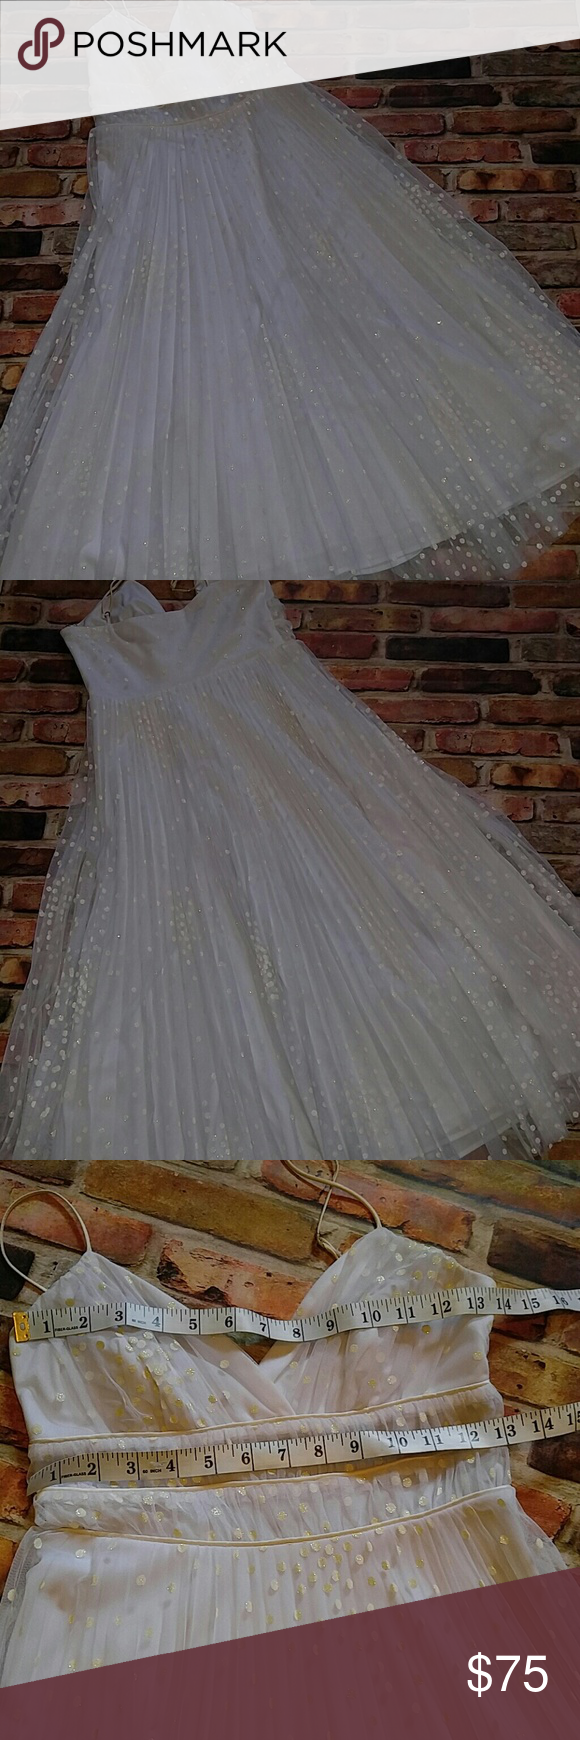 Betsey johnson prom dress white sz p in my posh picks